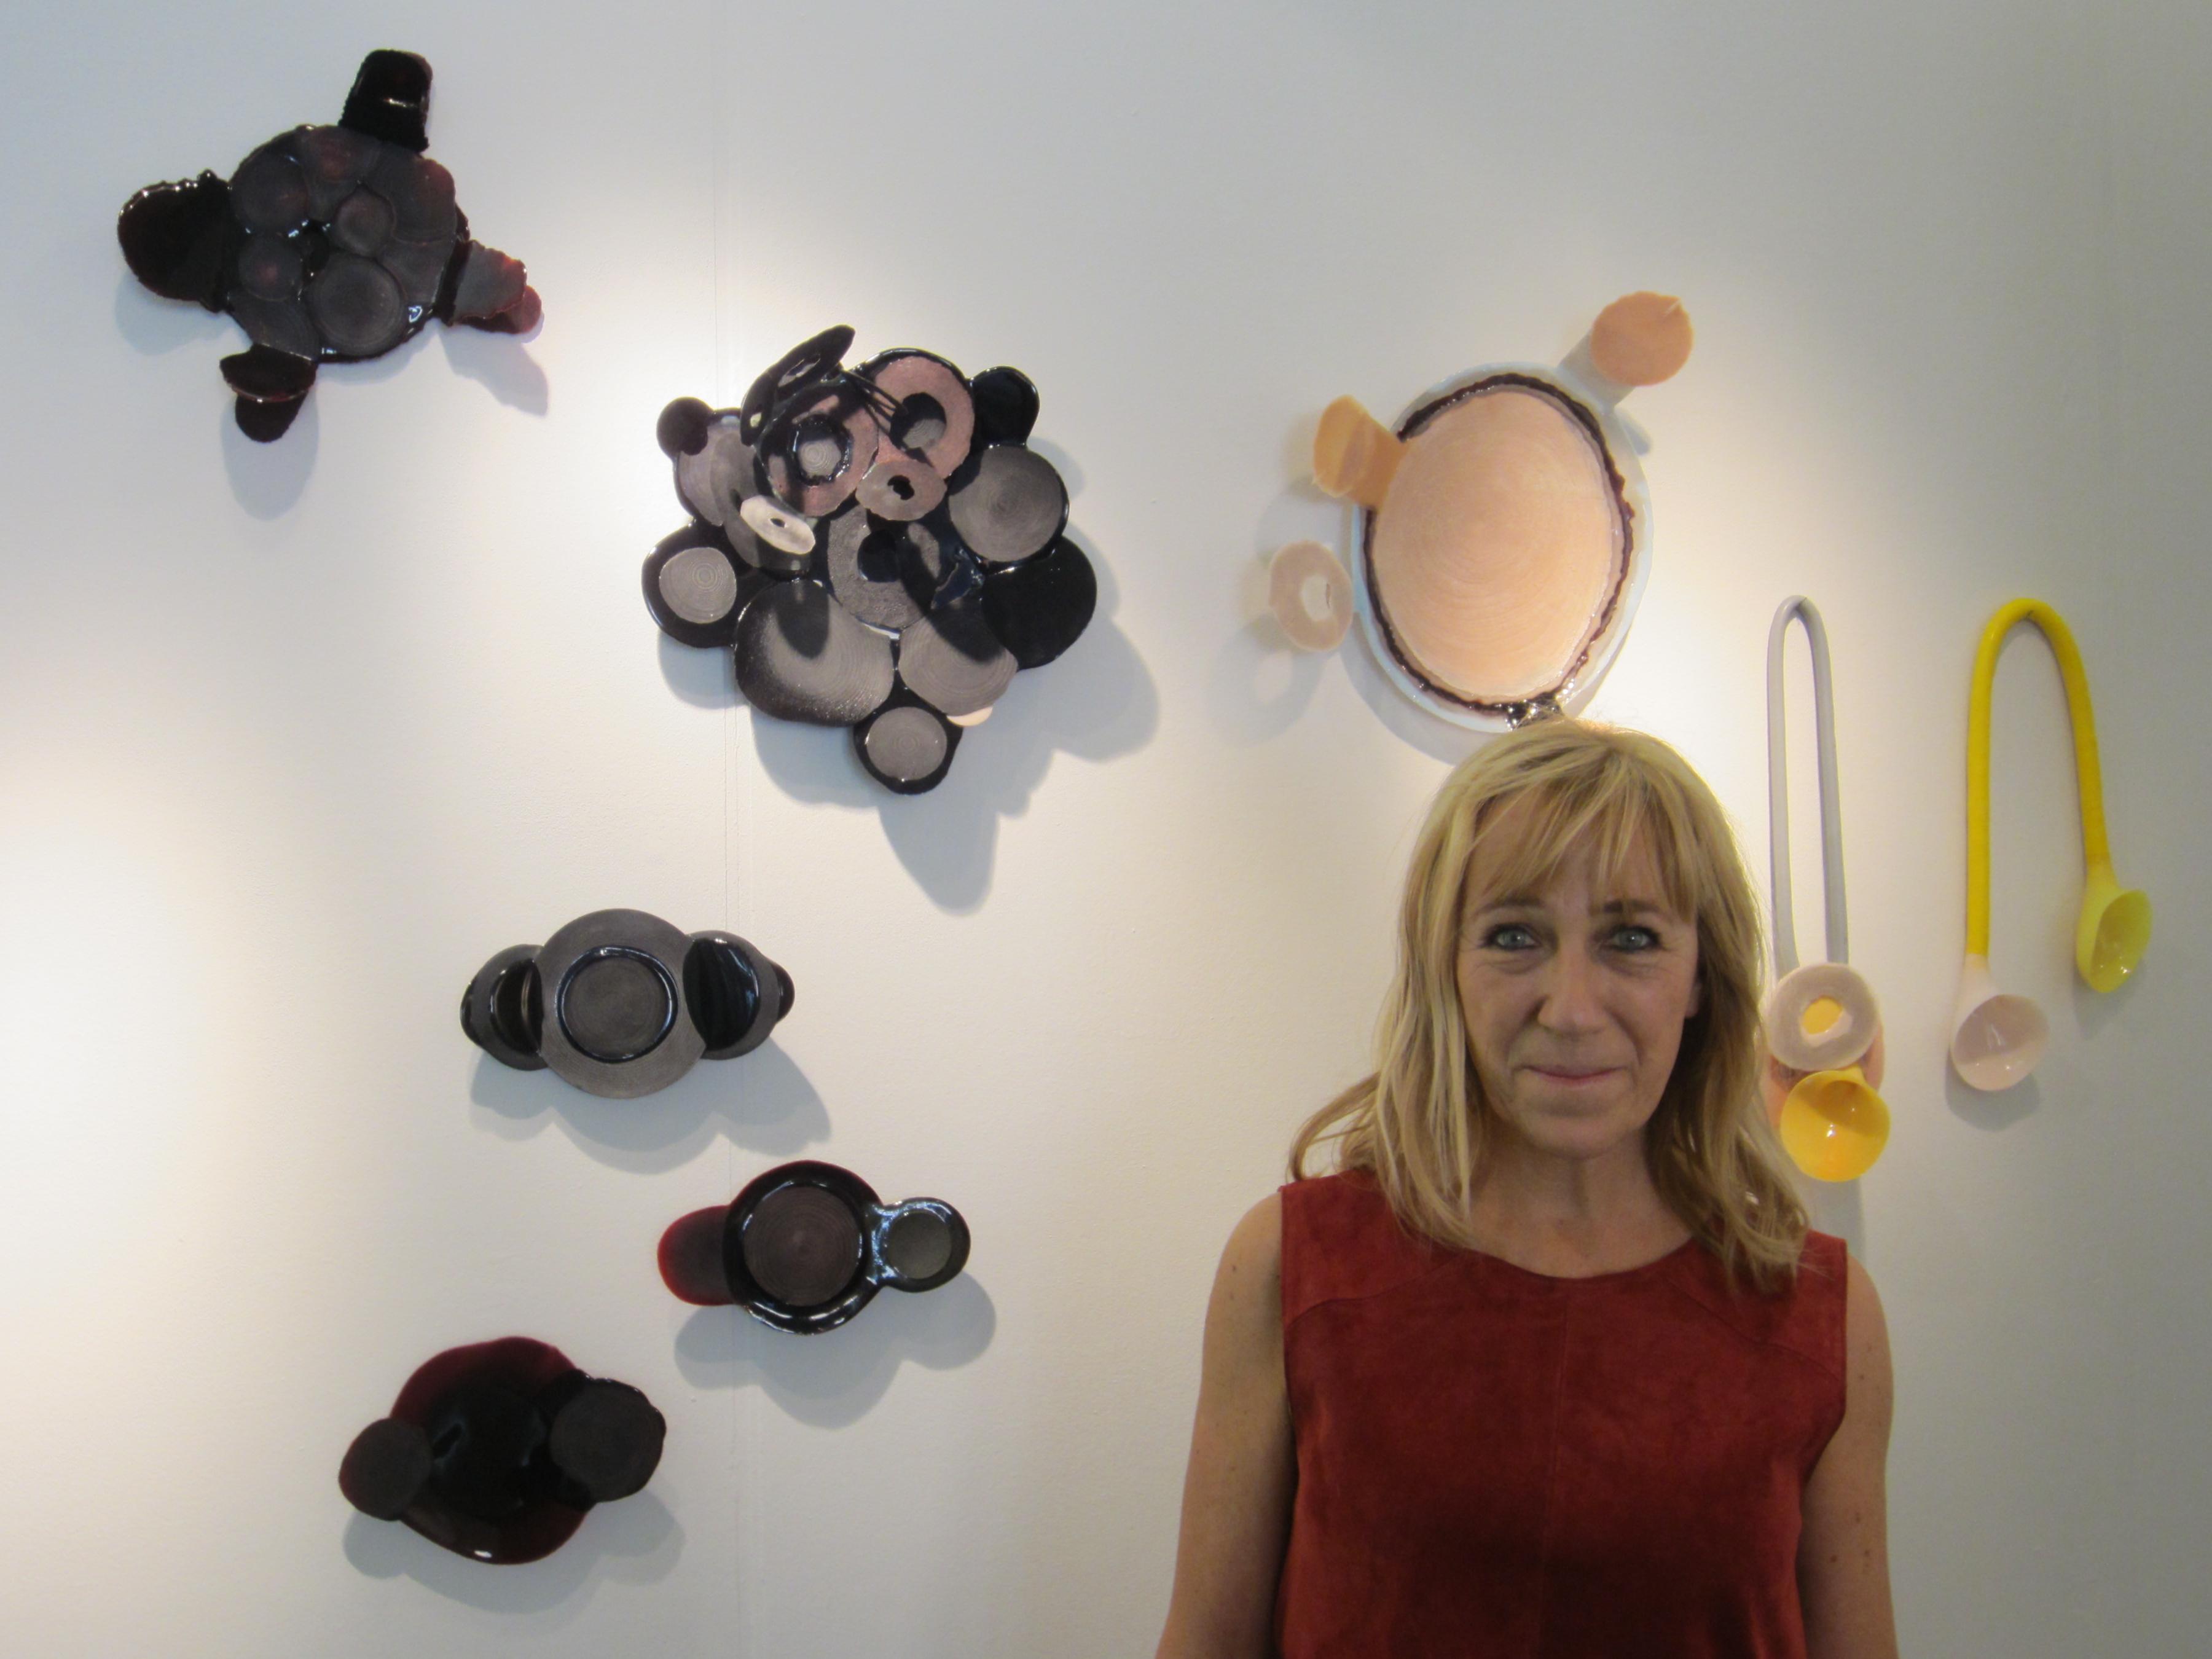 Ela Bauer in Galerie Ra, 2 juli 2016, portret, halssieraden, objecten